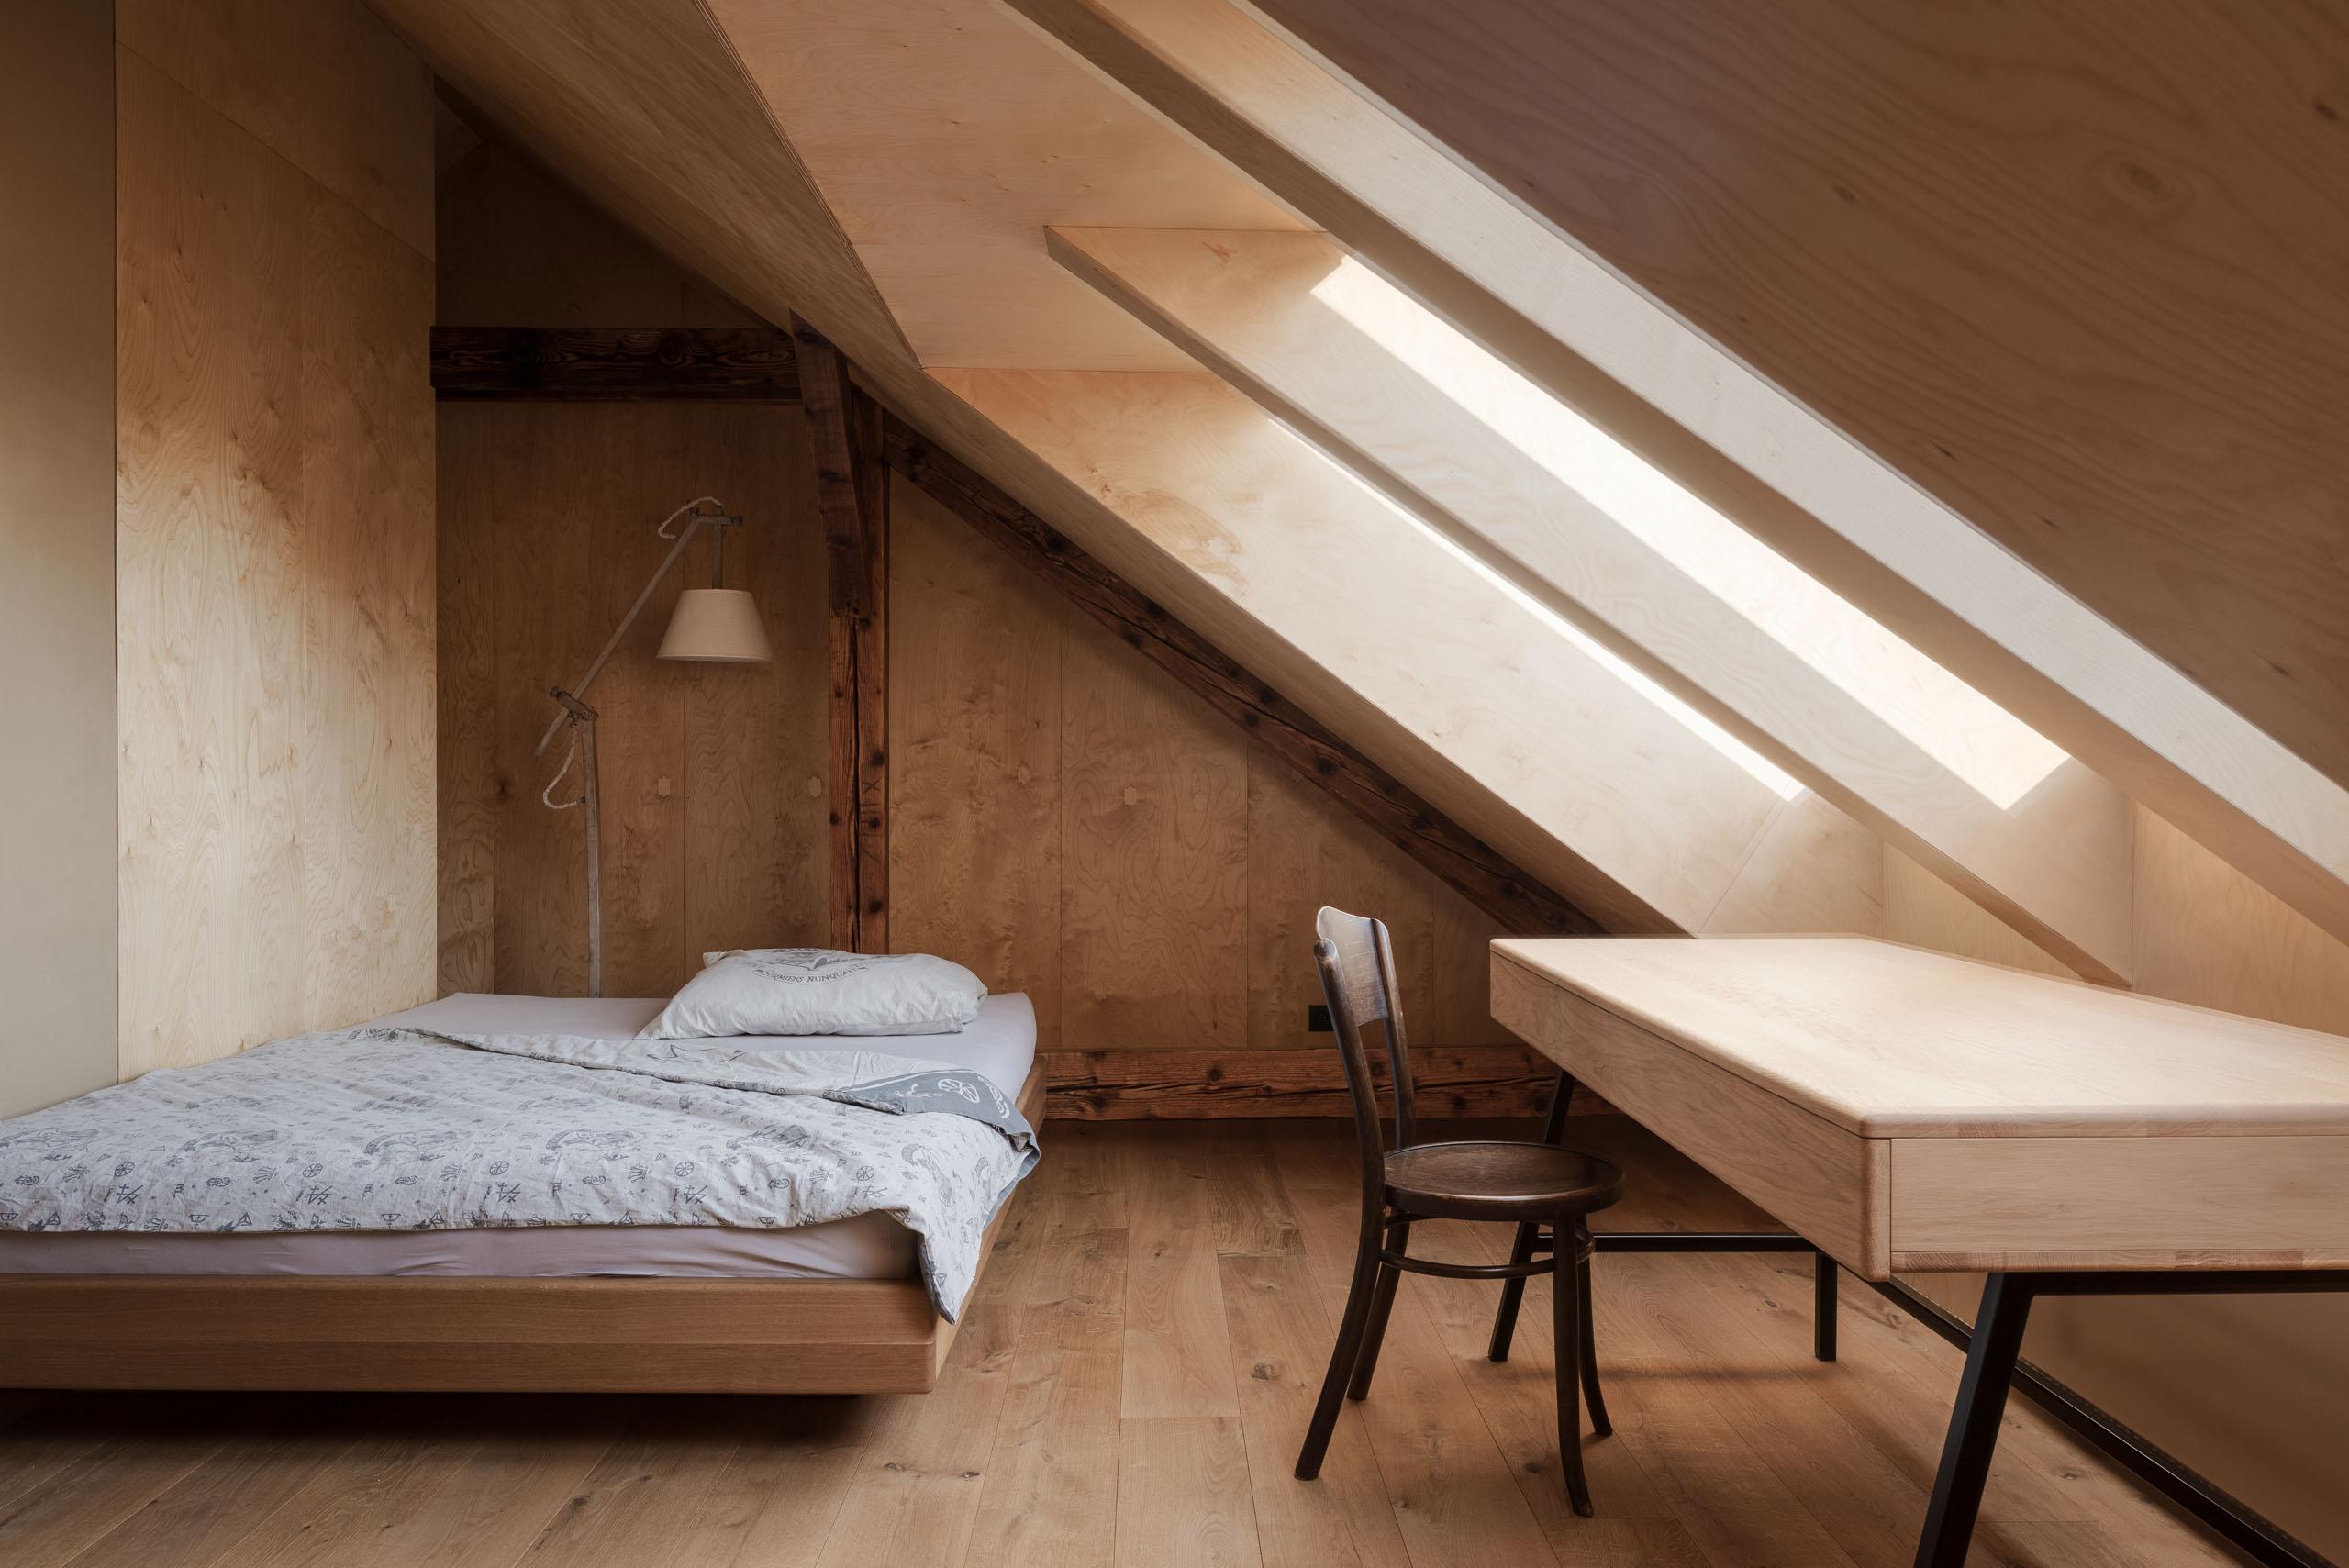 podkrovná izba s posteľou a pracovným stolom